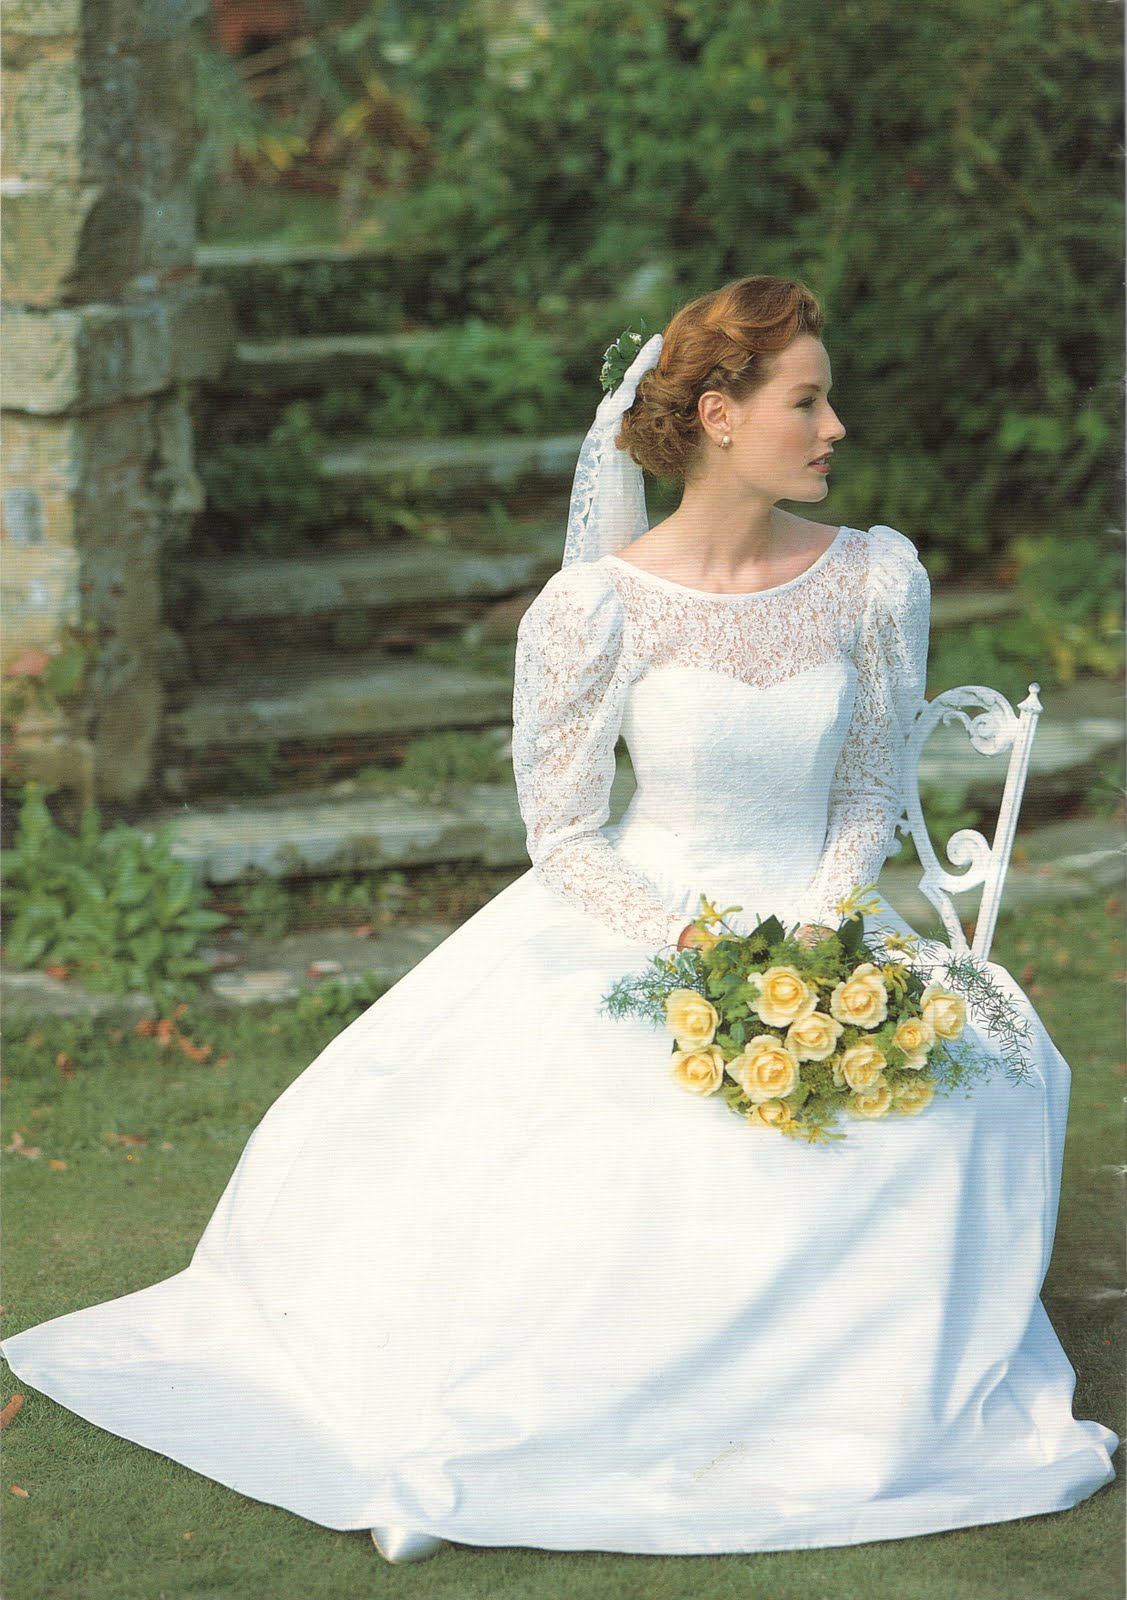 spriggs florist: wedding flowers for laura ashley circa 1993